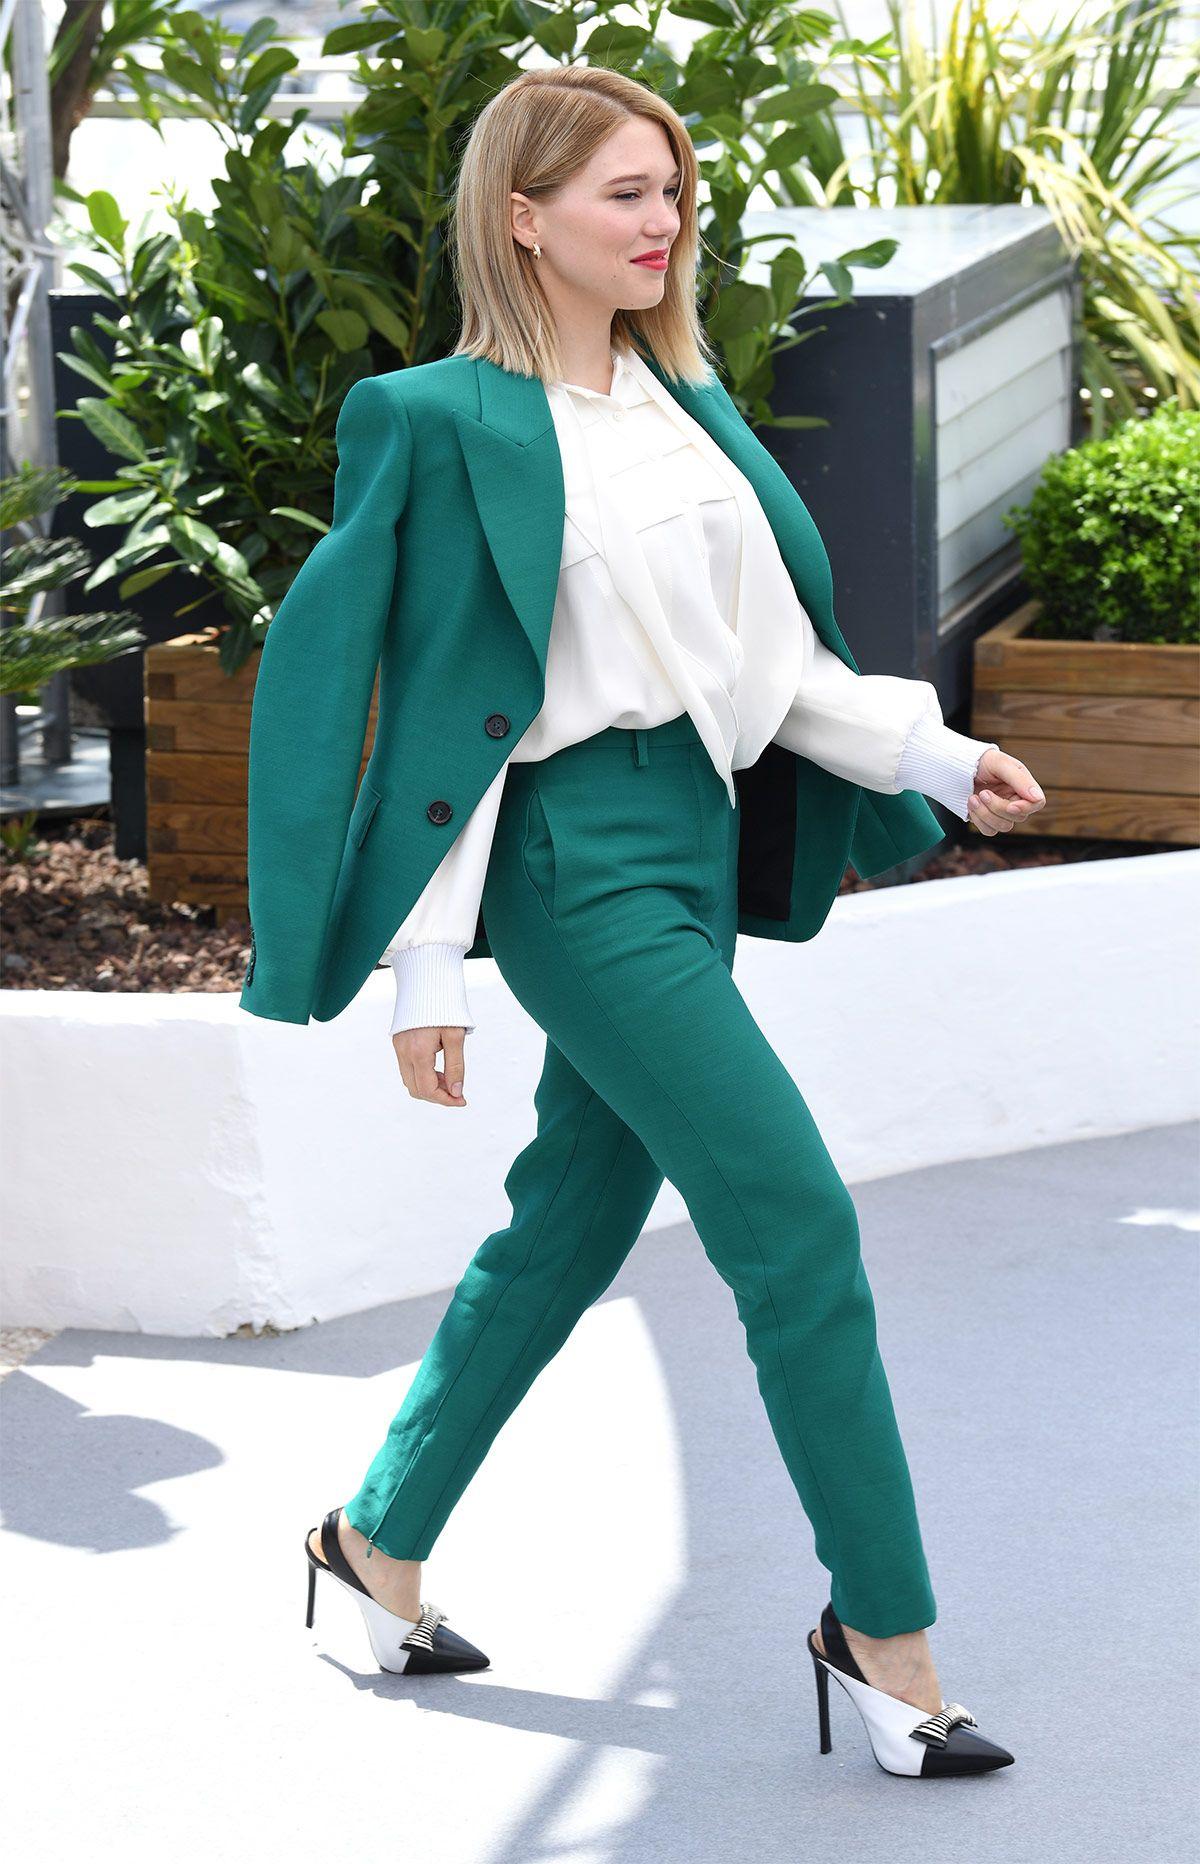 Festival Cannes, Festival Cannes 2018, jurado Festival Cannes, Cate Blanchett